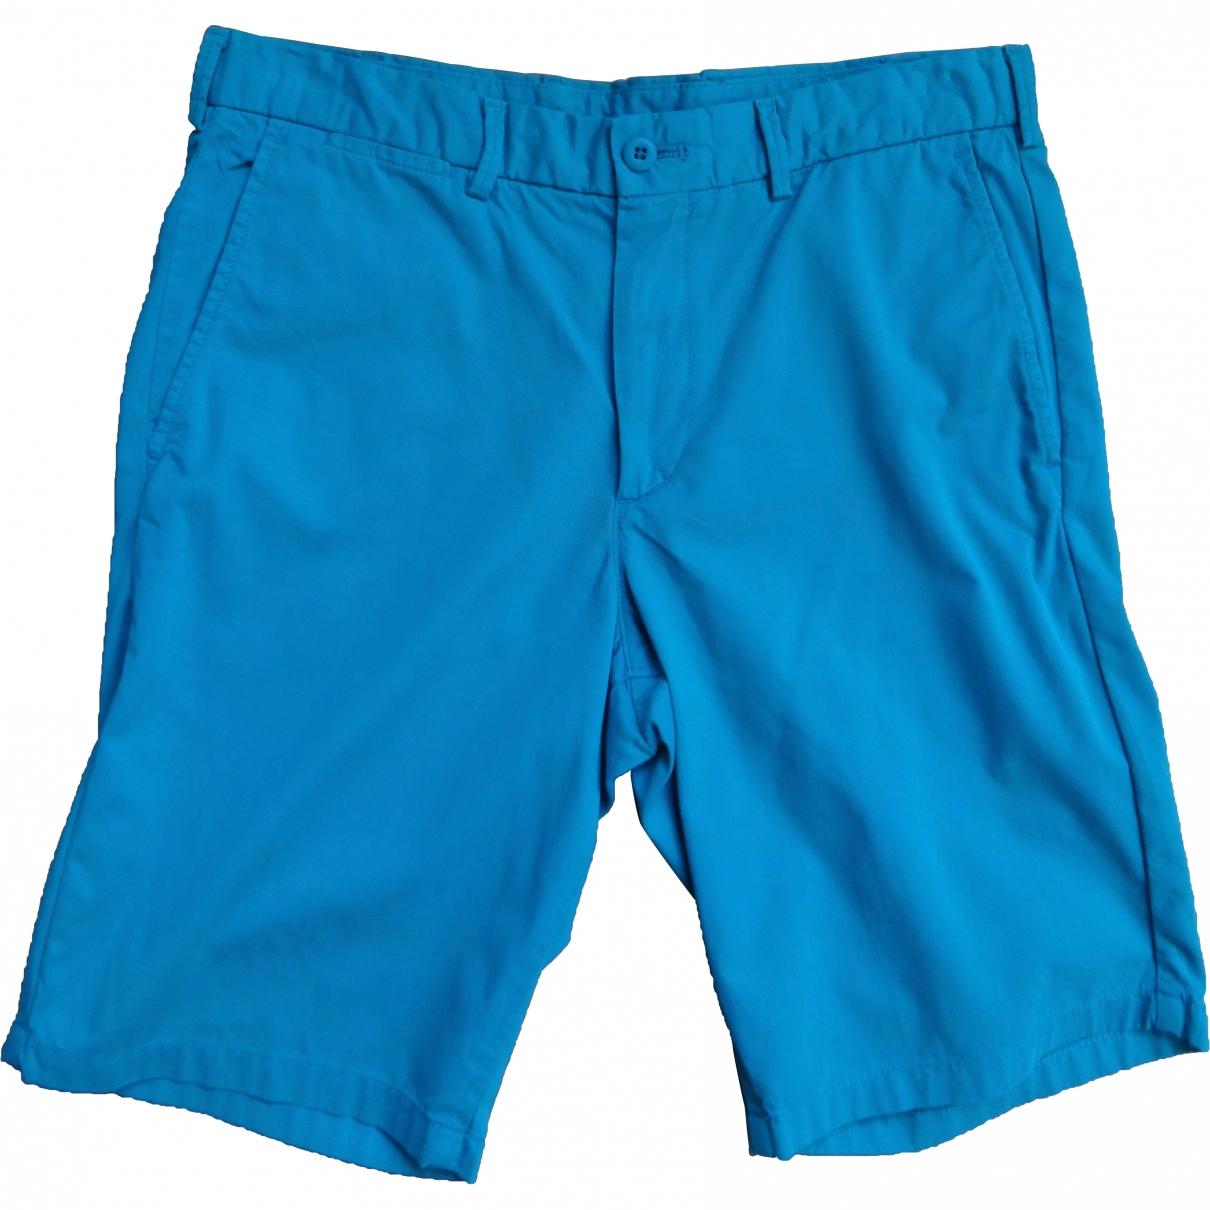 Uniqlo \N Turquoise Cotton Shorts for Men M International